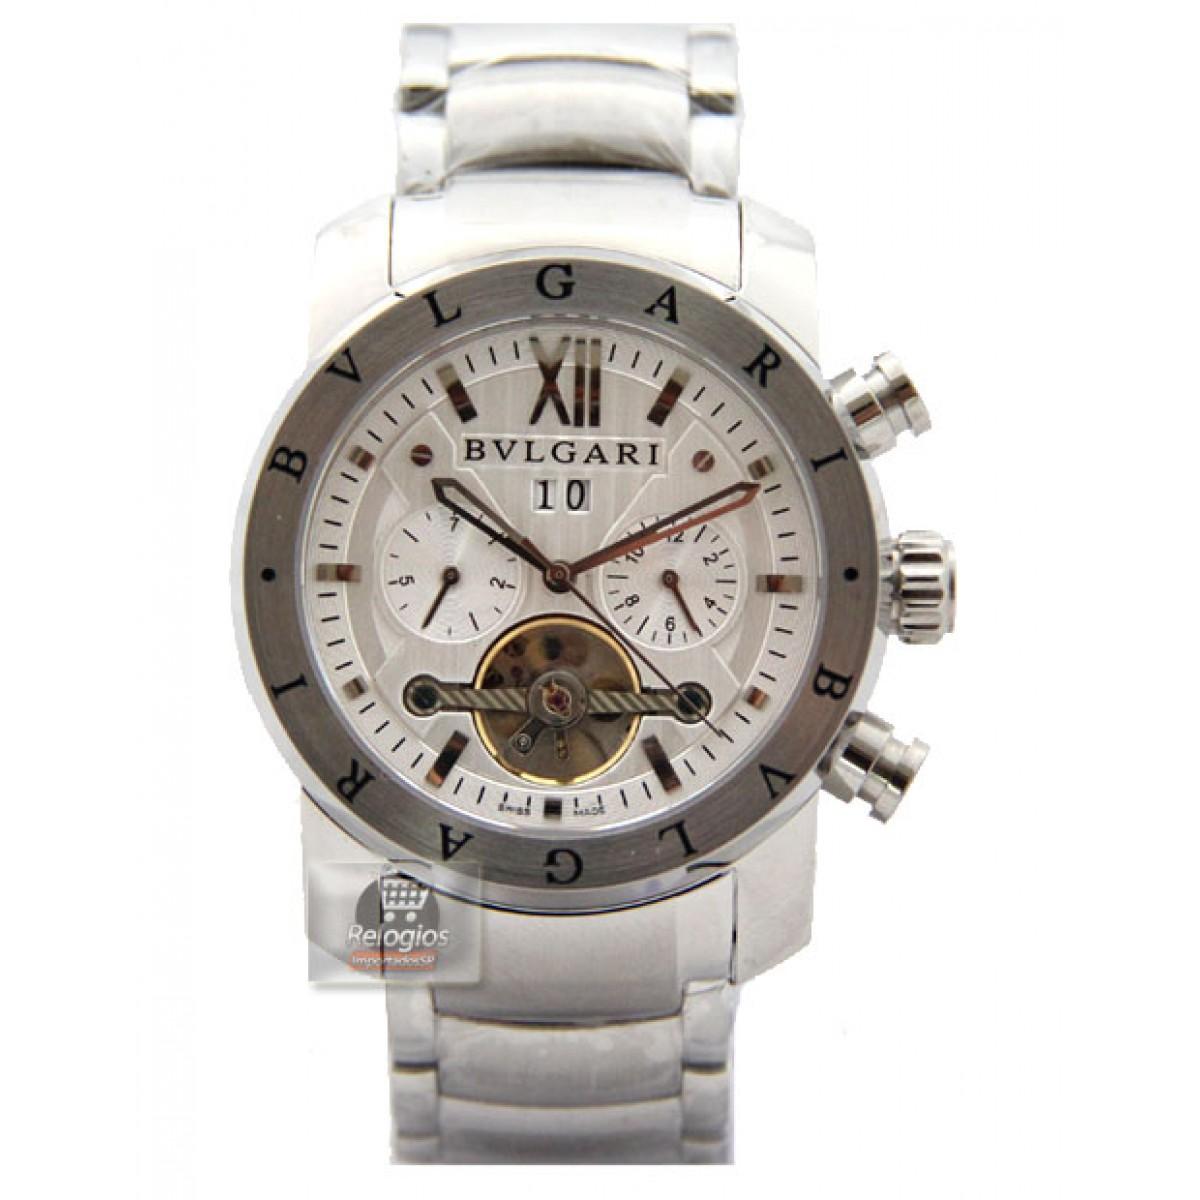 bb2f051876a Relógio Réplica Bulgari Homem de Ferro Prata Branco